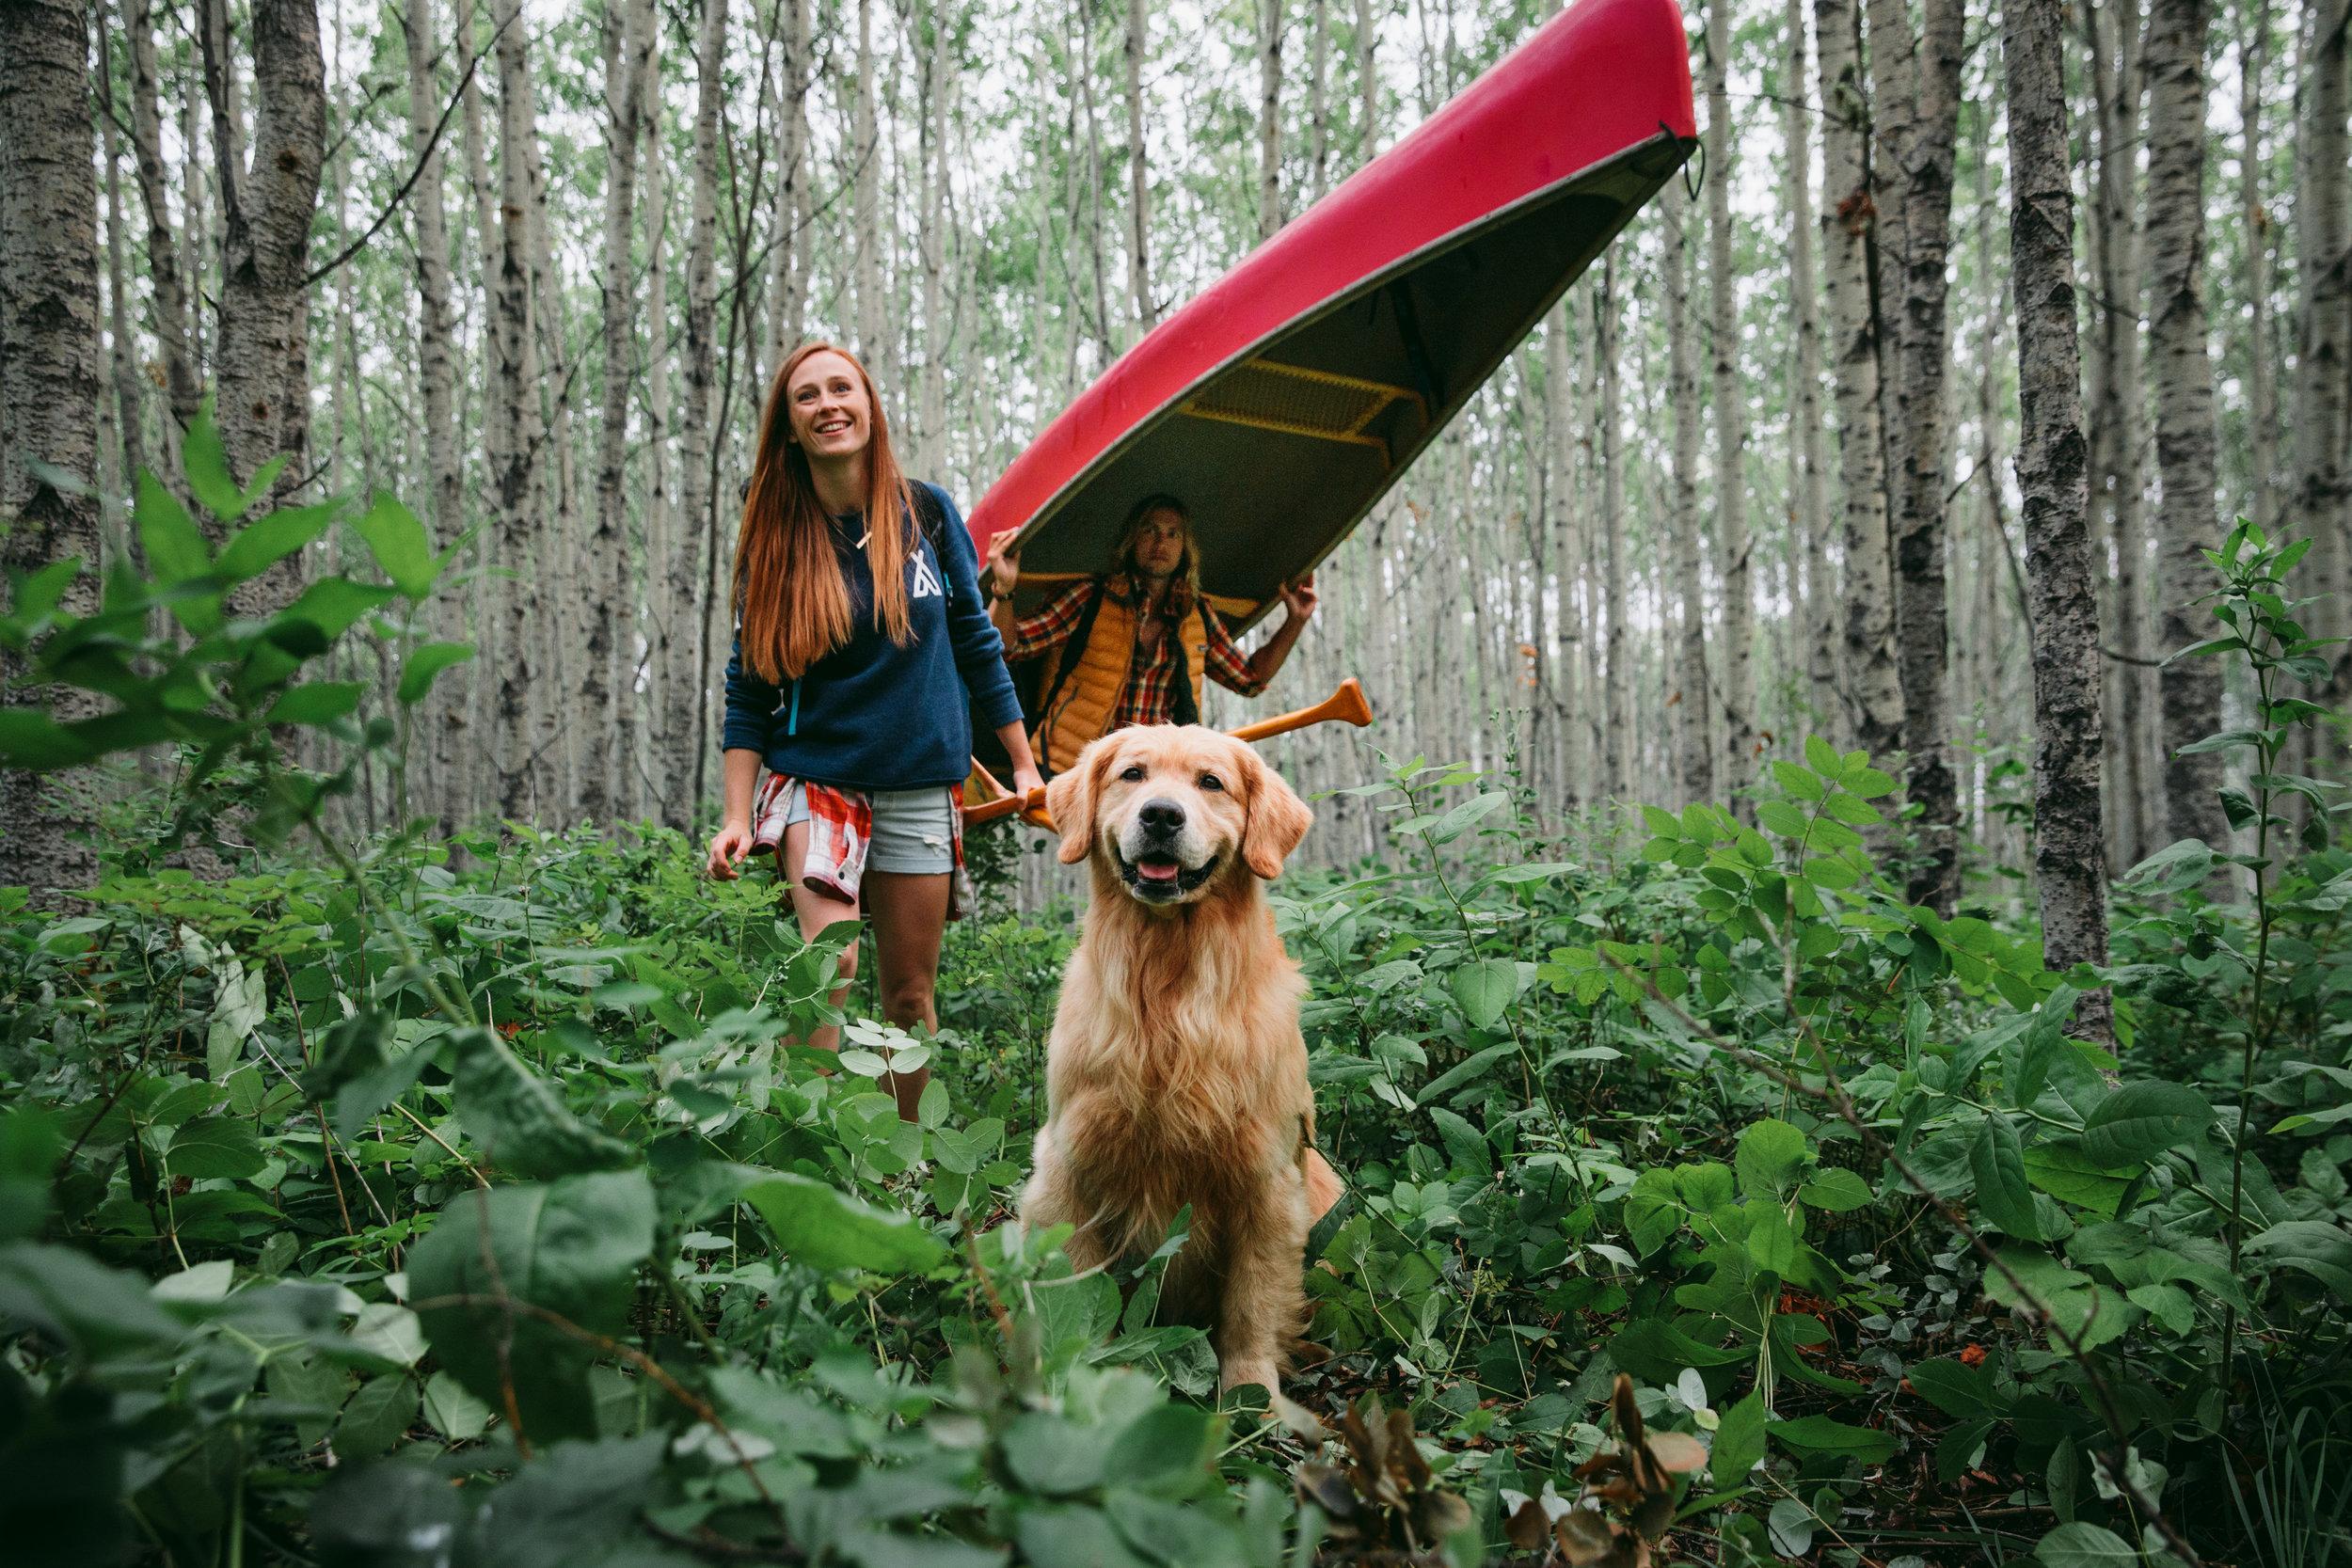 MikeSeehagel-TravelAlberta-Ready-Rebrand_Canada-LifestylePhotography_18.jpg